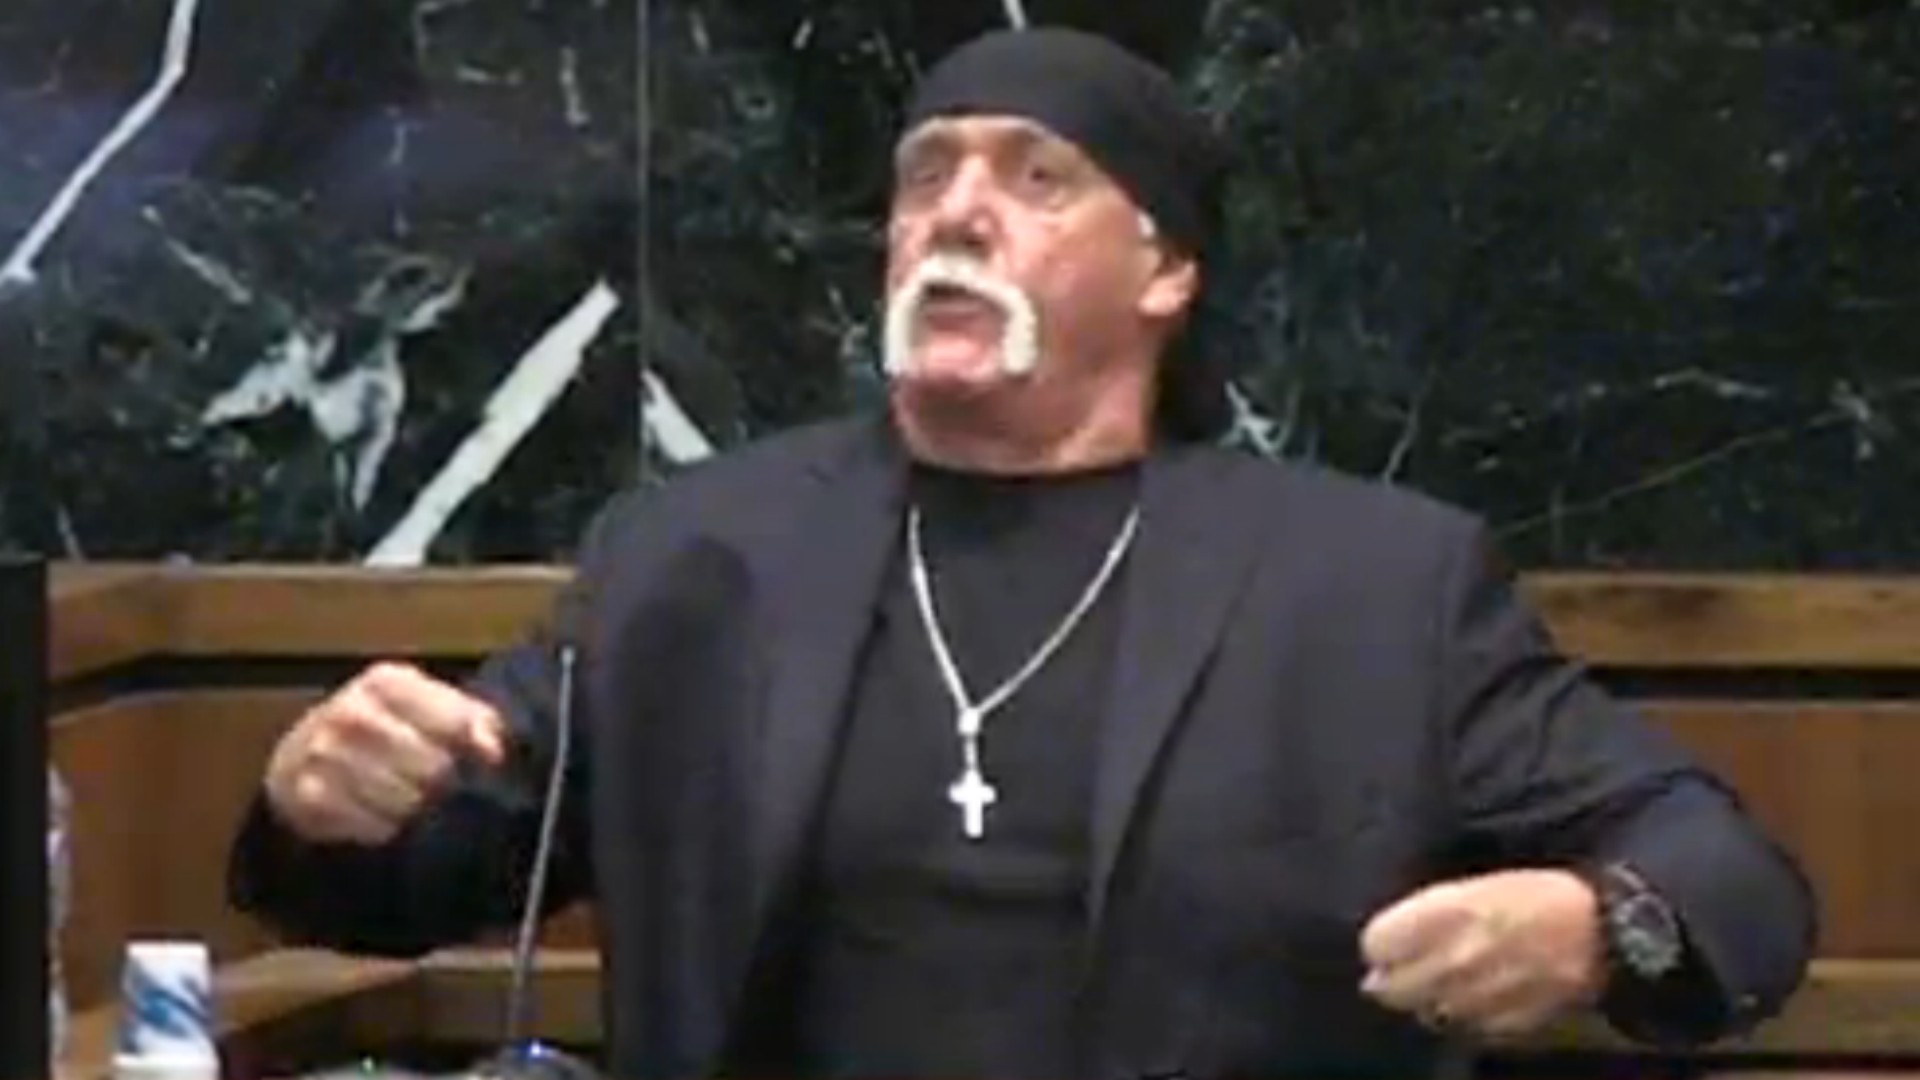 wwe news hulk hogan gawker trial summary bubba the love sponge sex tape video terry bollea eiuzuukak